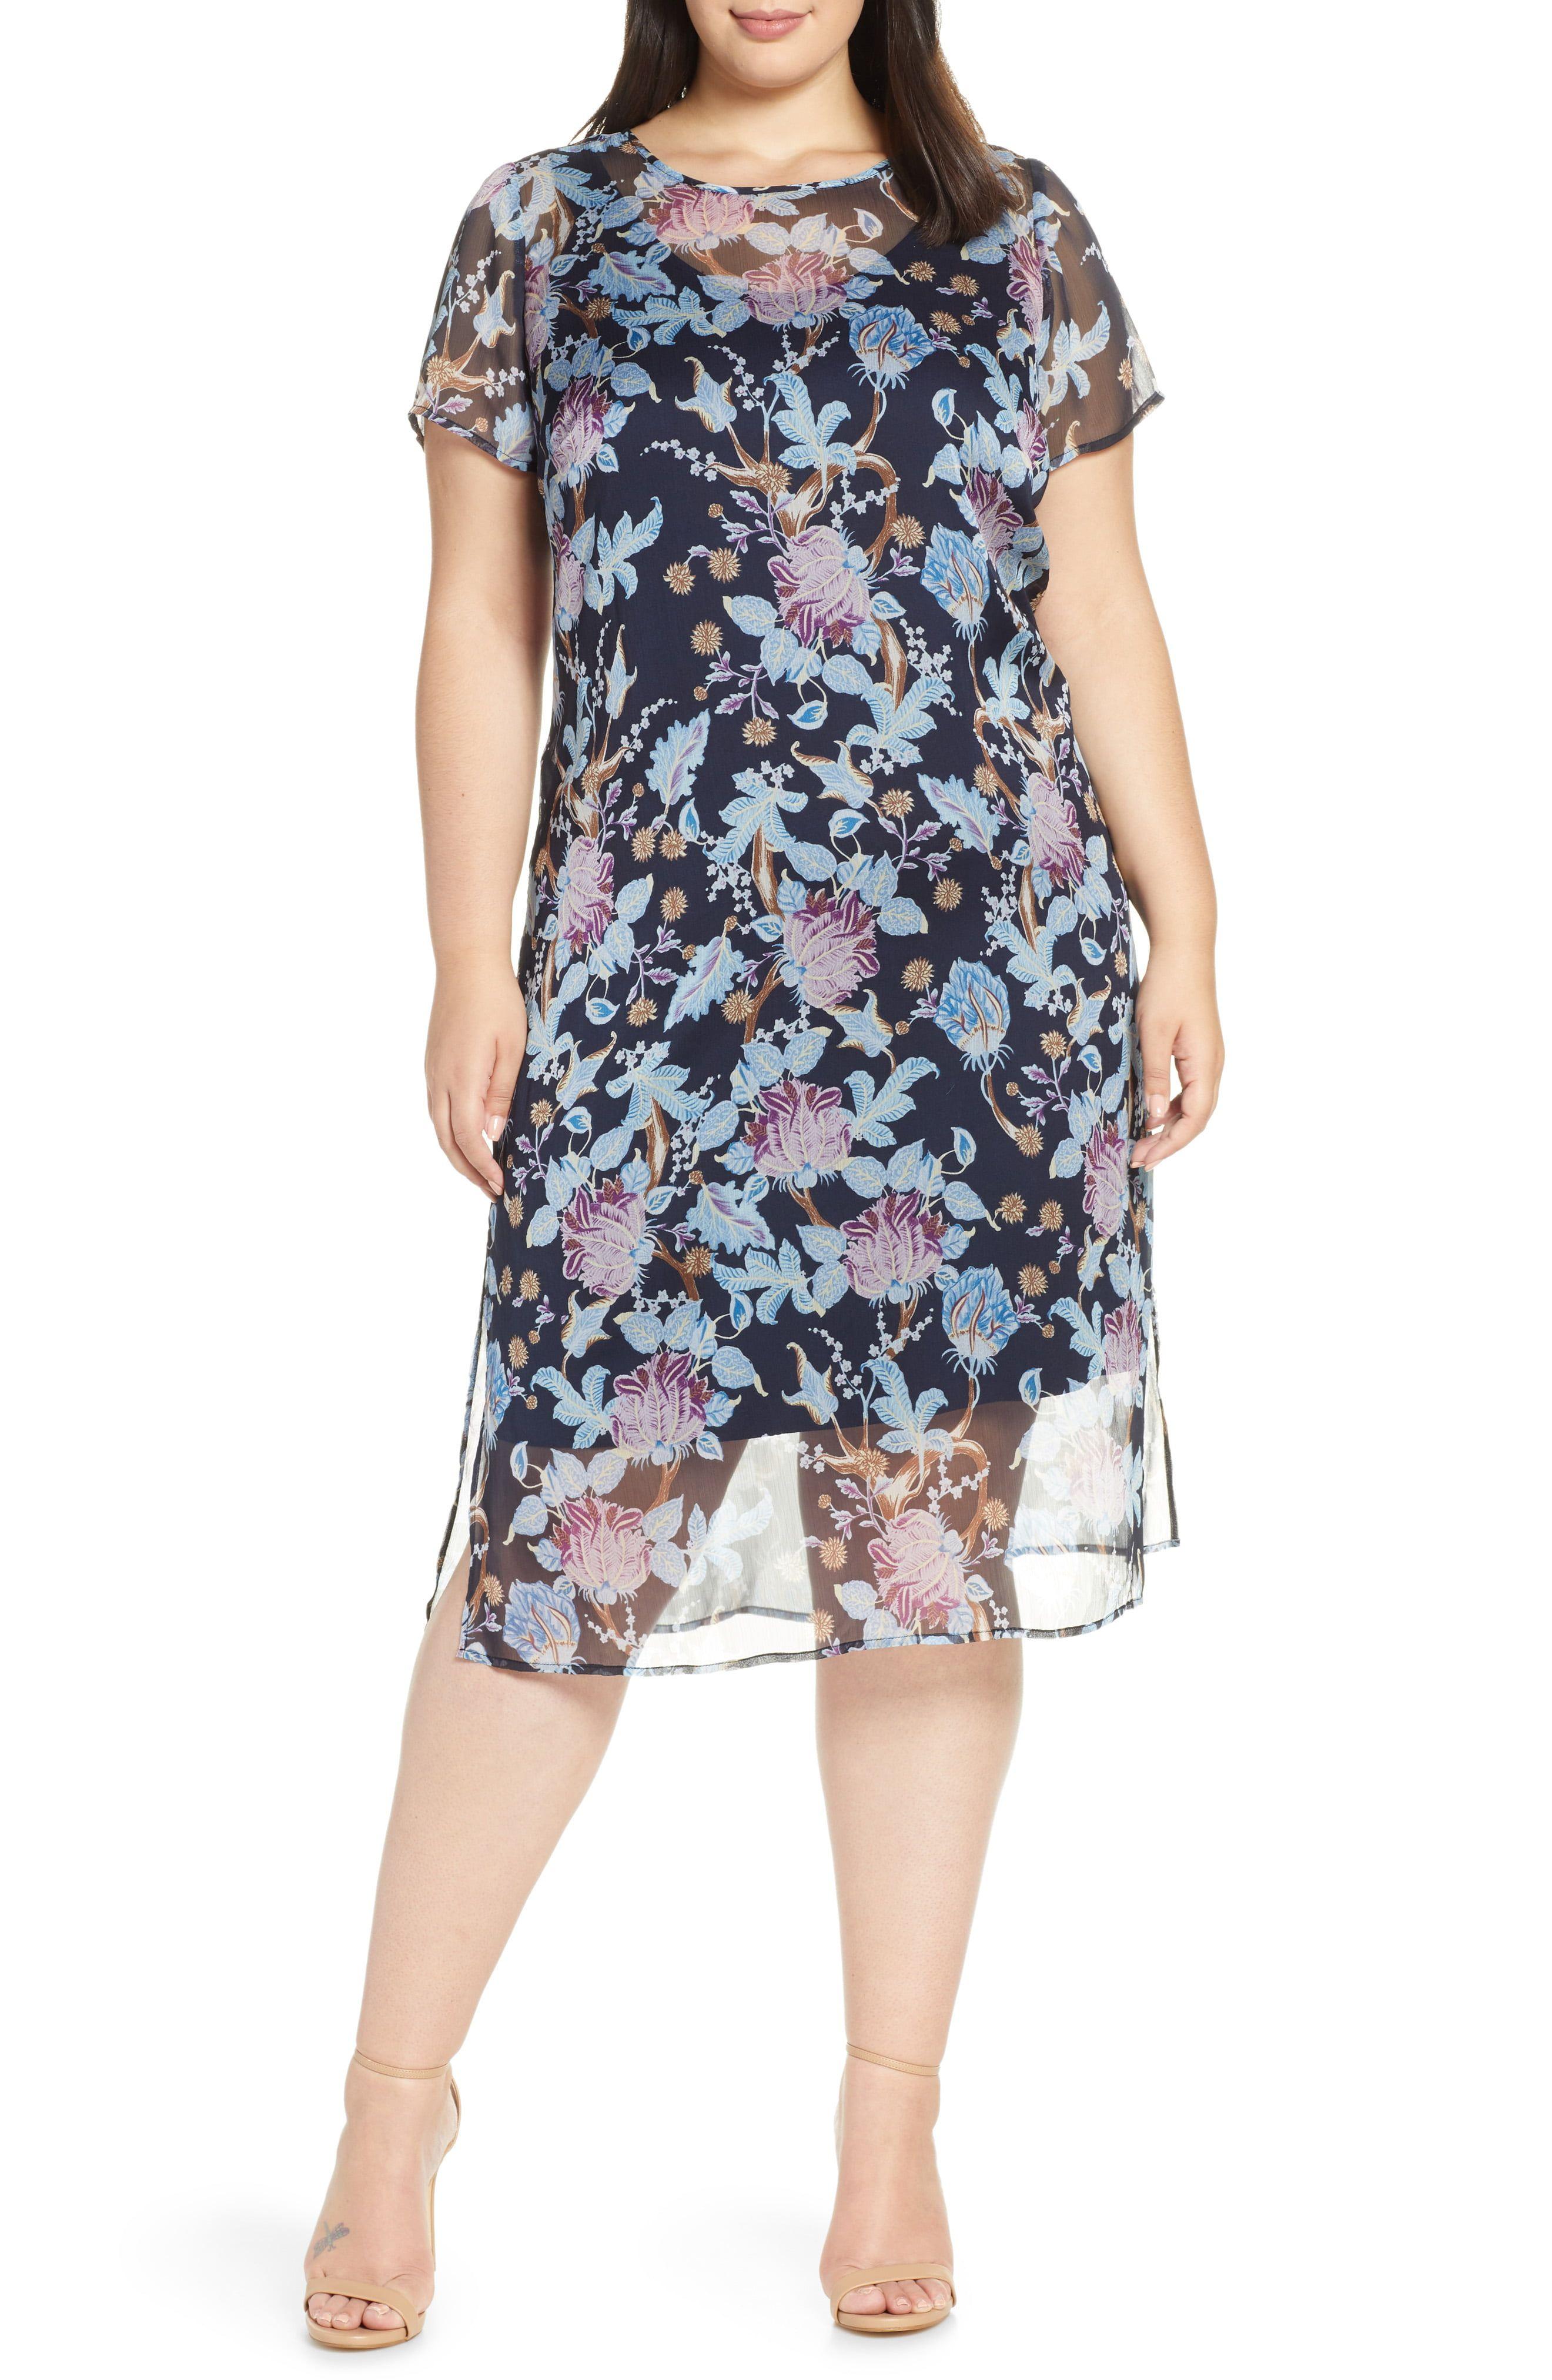 6ed1e17748c5 Plus Size Women's Vince Camuto Poetic Blooms Overlay Midi Dress, Size 1X -  Blue